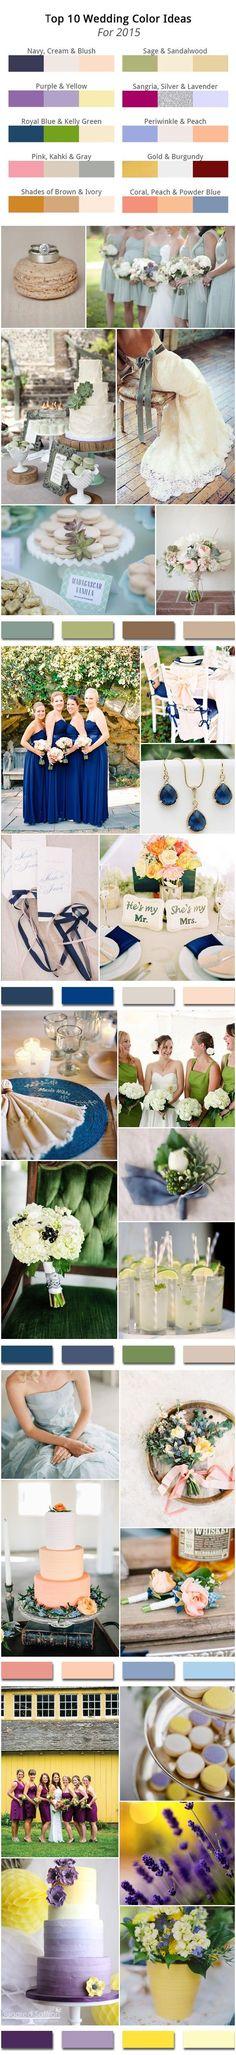 Top 10 Wedding Color Ideas for 2015 Trends #weddingcolors